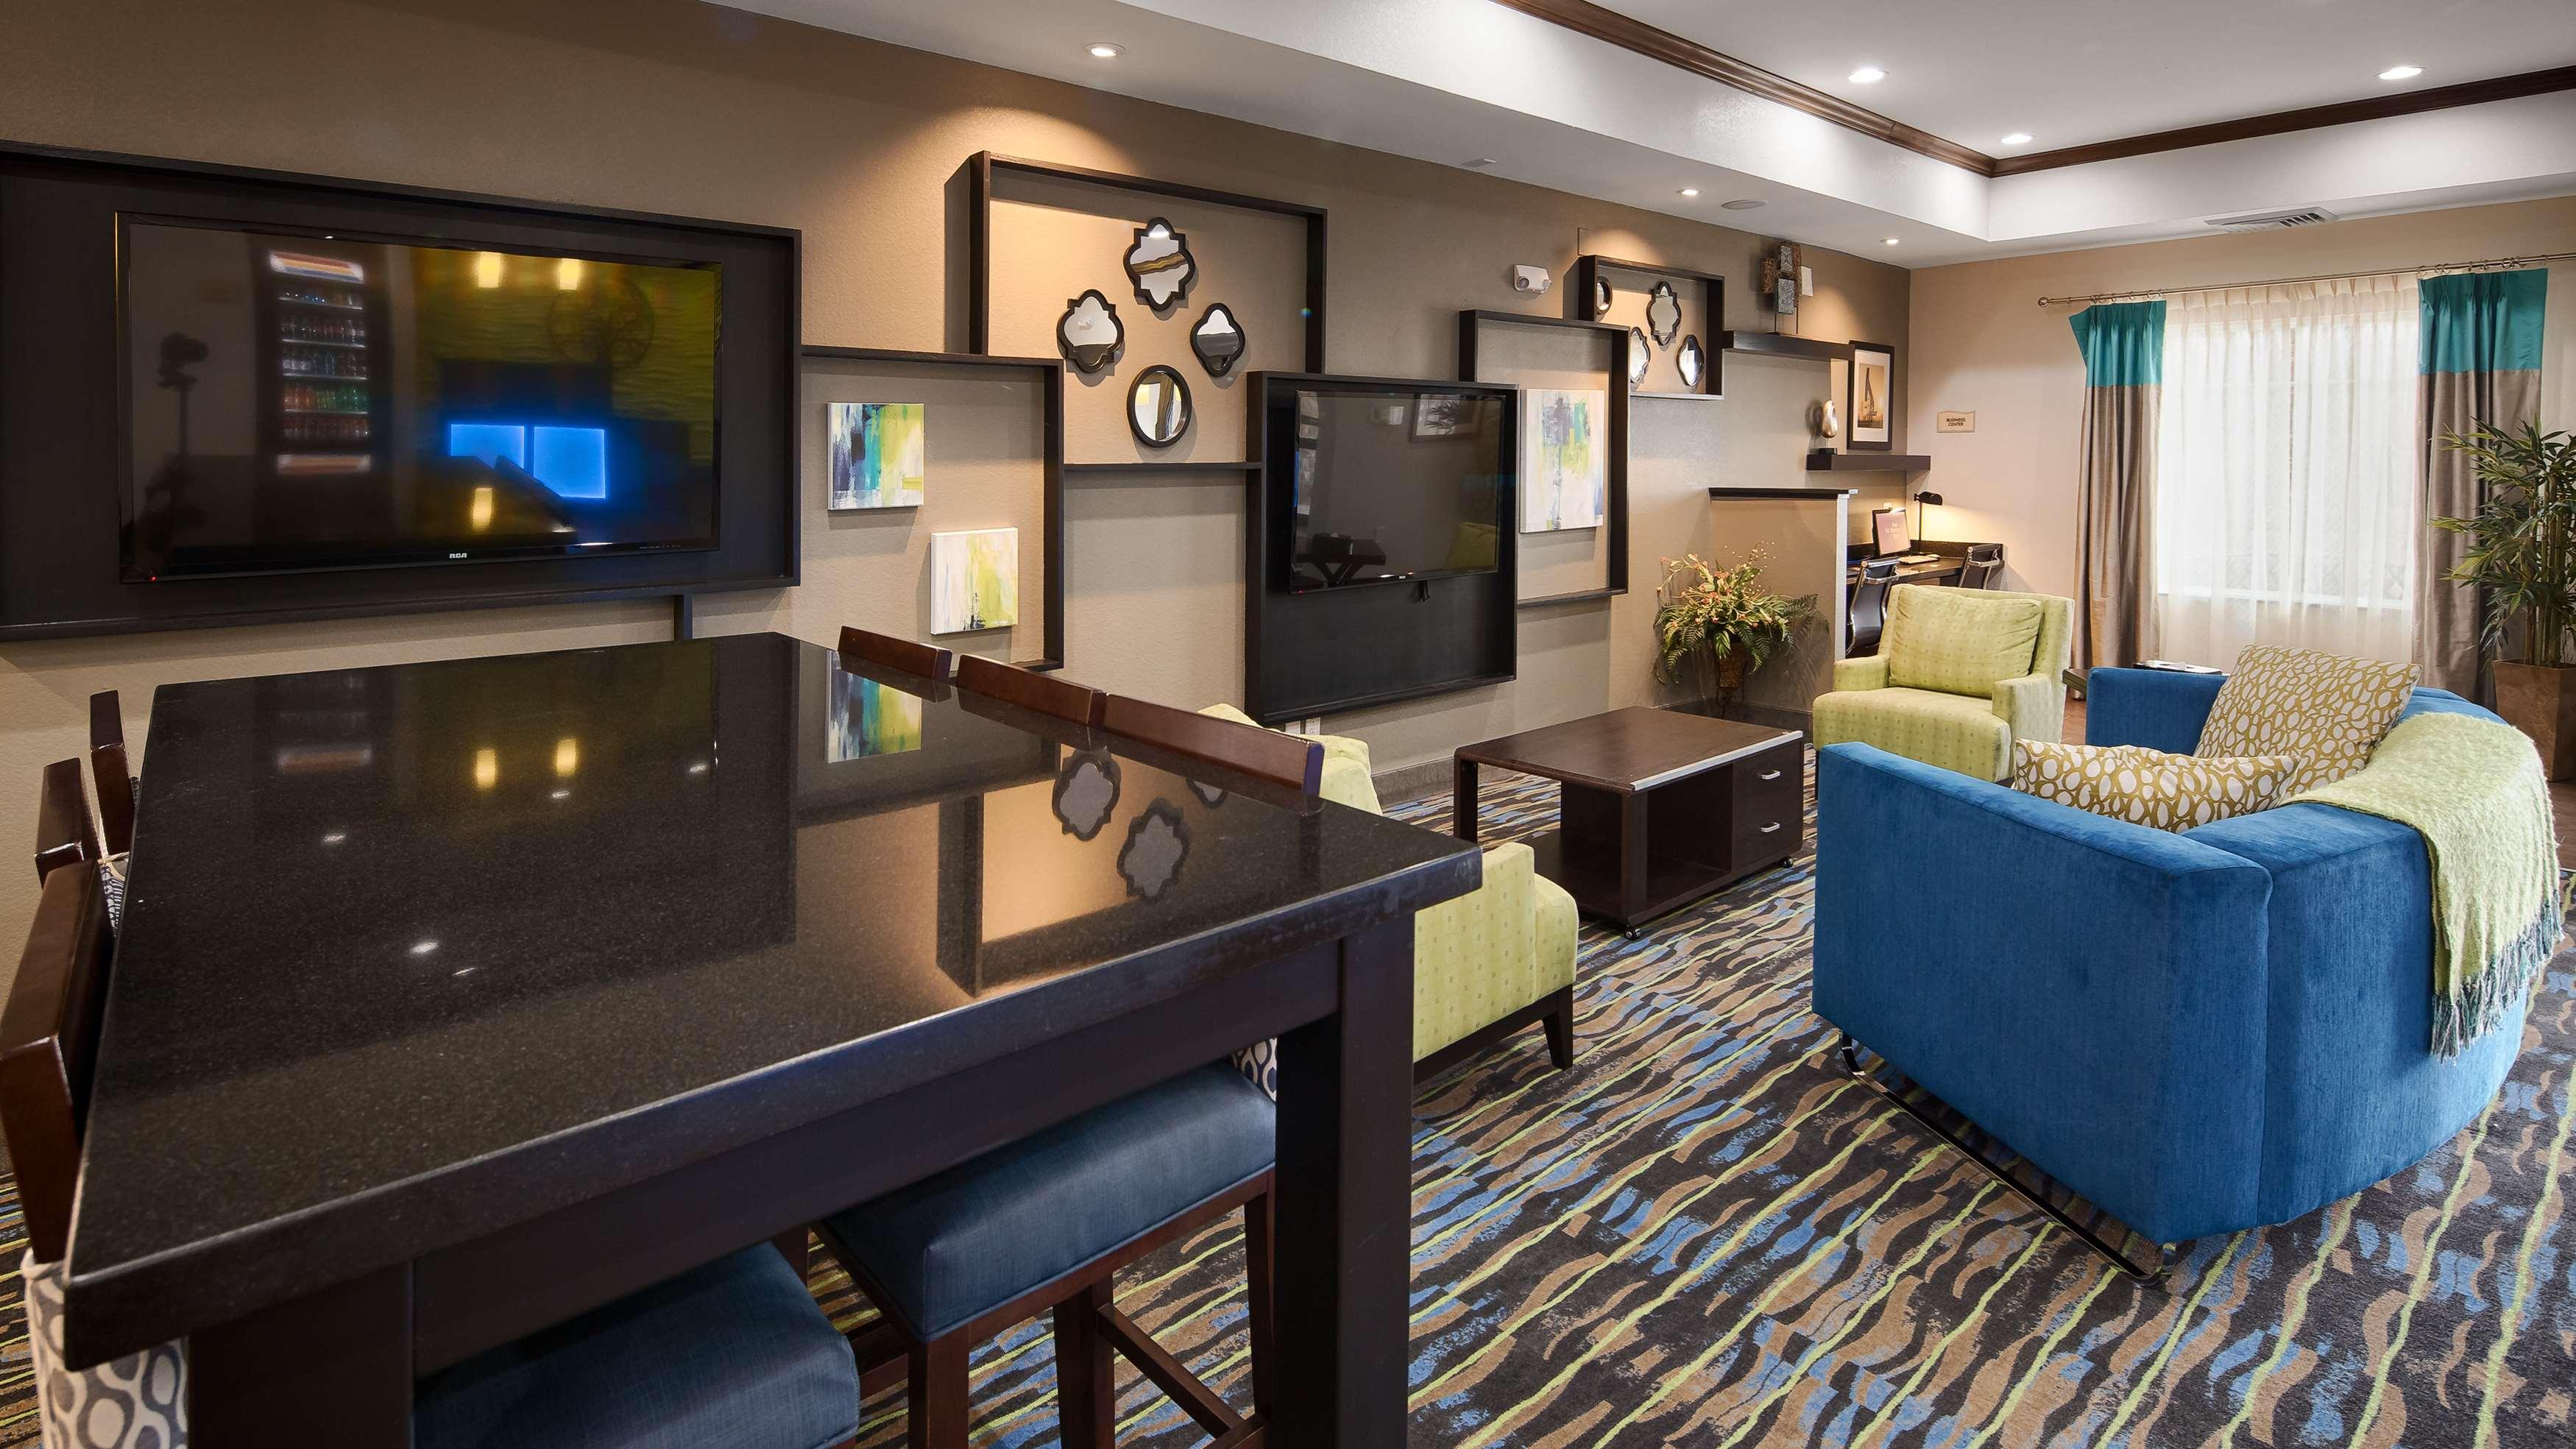 Best Western Plus Denver City Hotel & Suites image 3